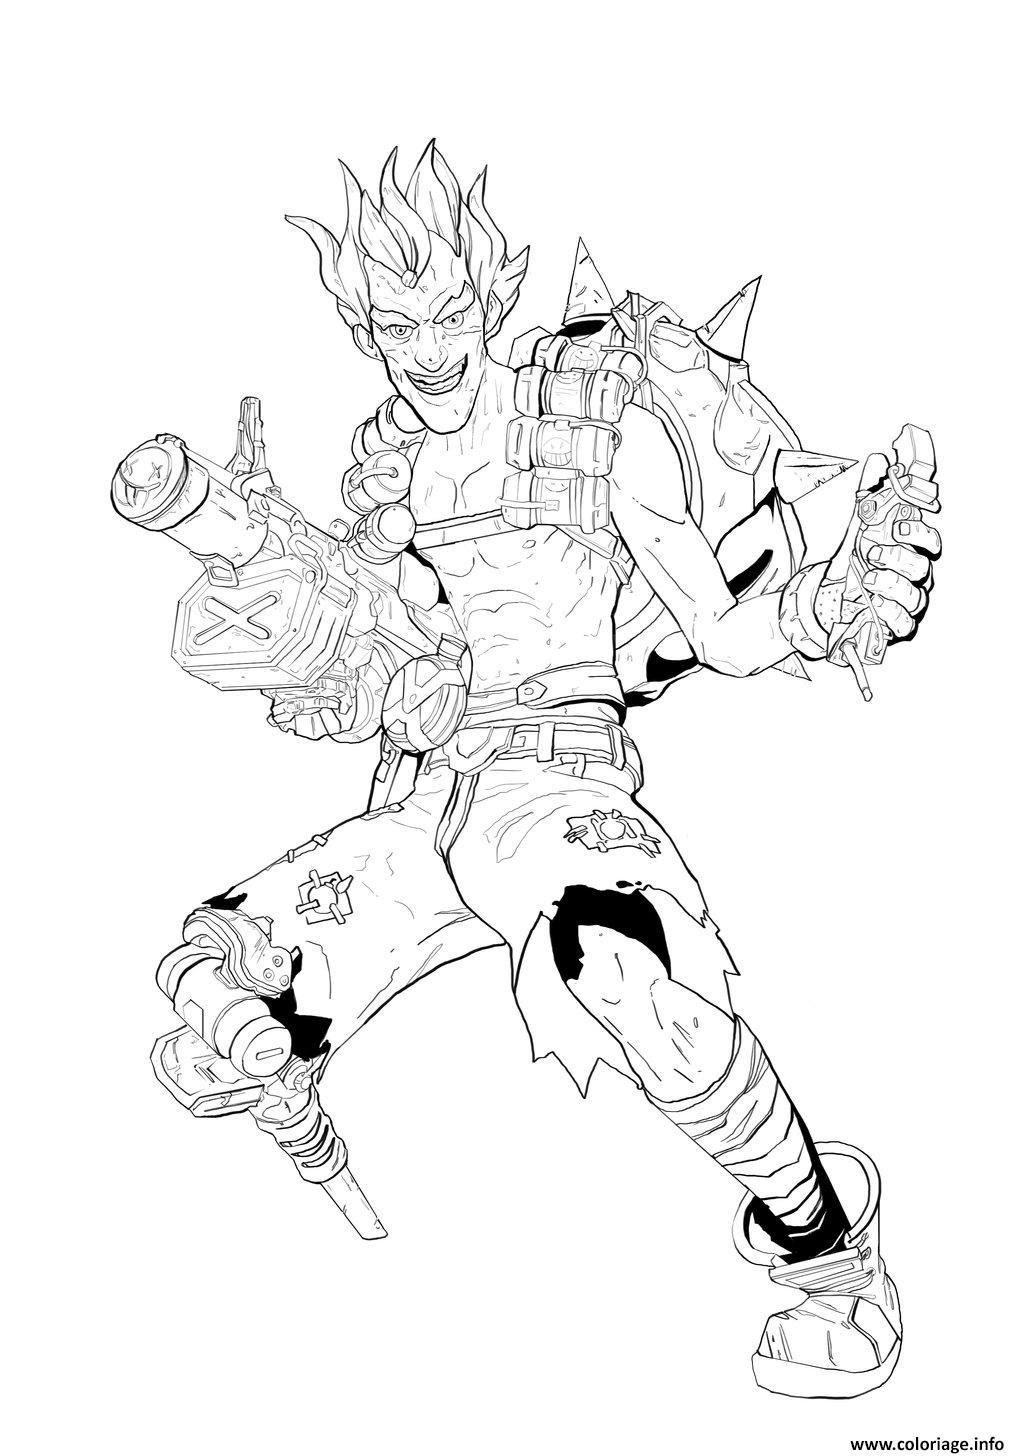 Coloriage Overwatch Chacal Heros De Defense Jecoloriecom